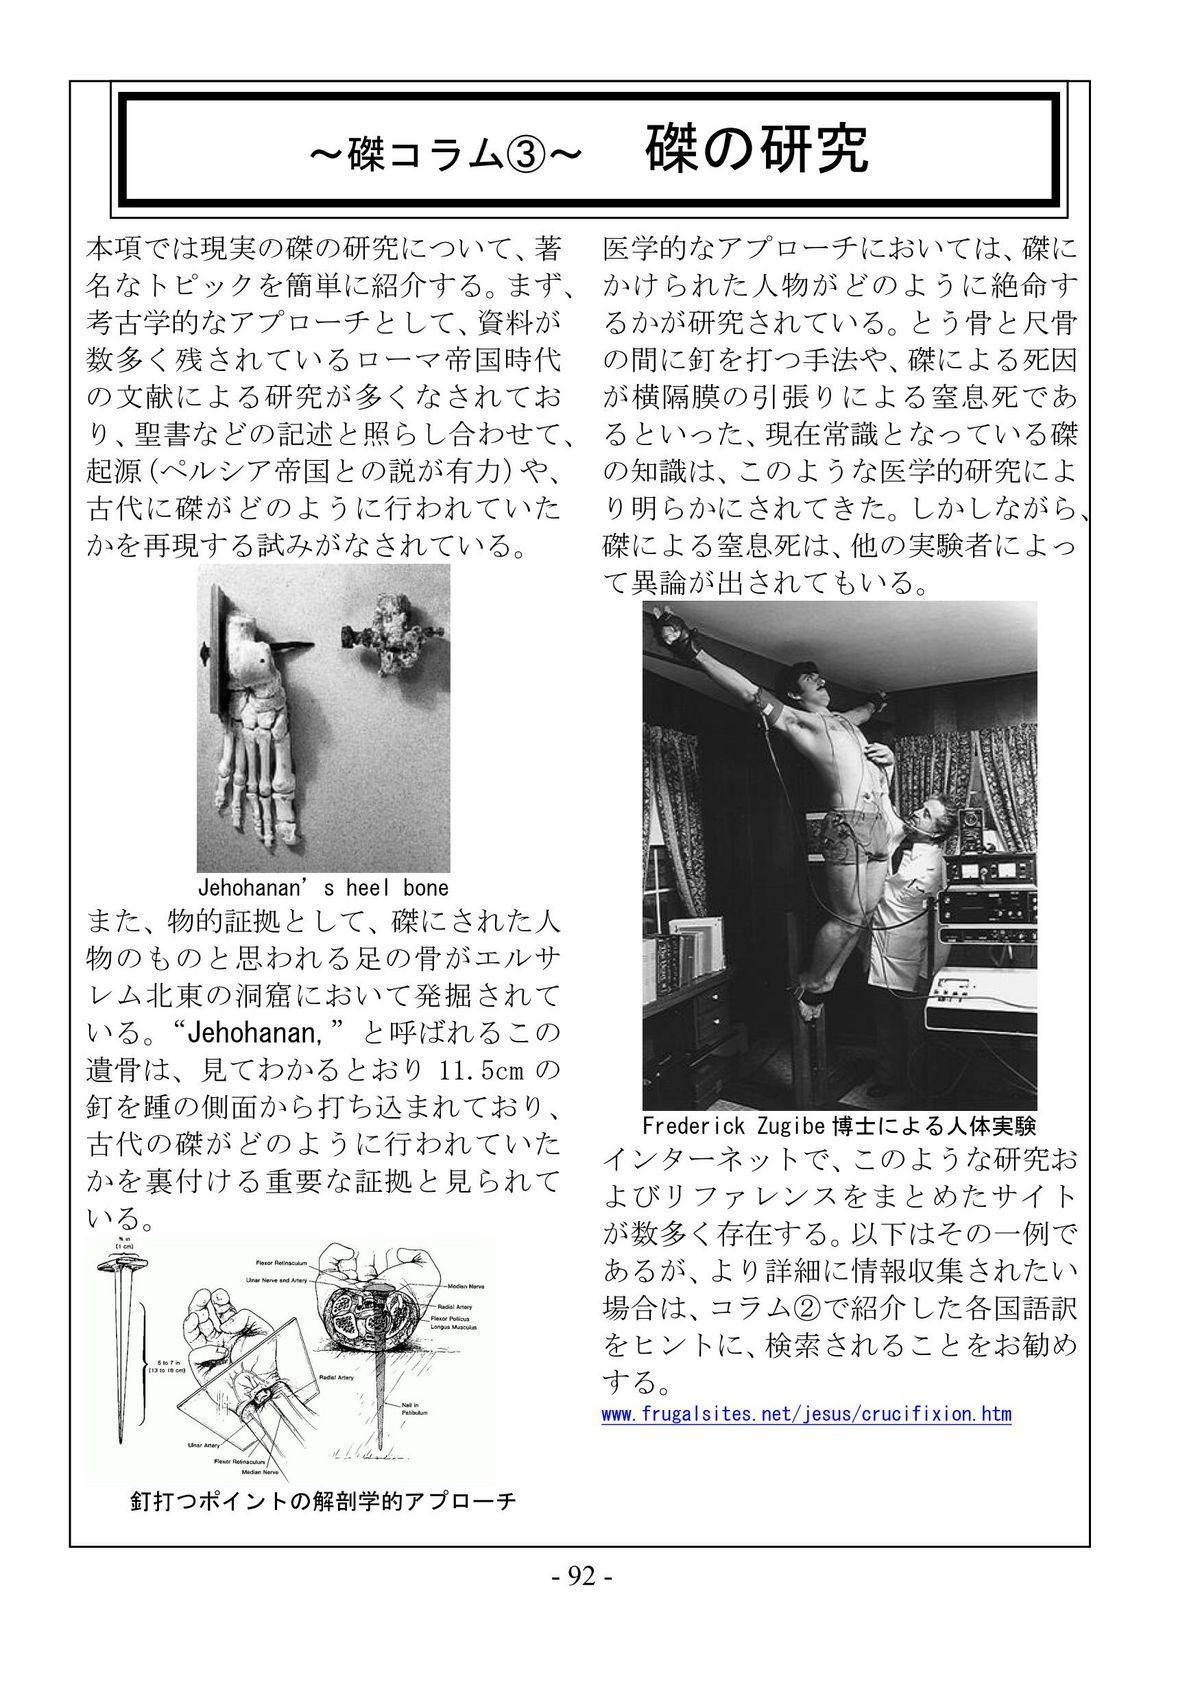 encyclopedia of crucifixion 92